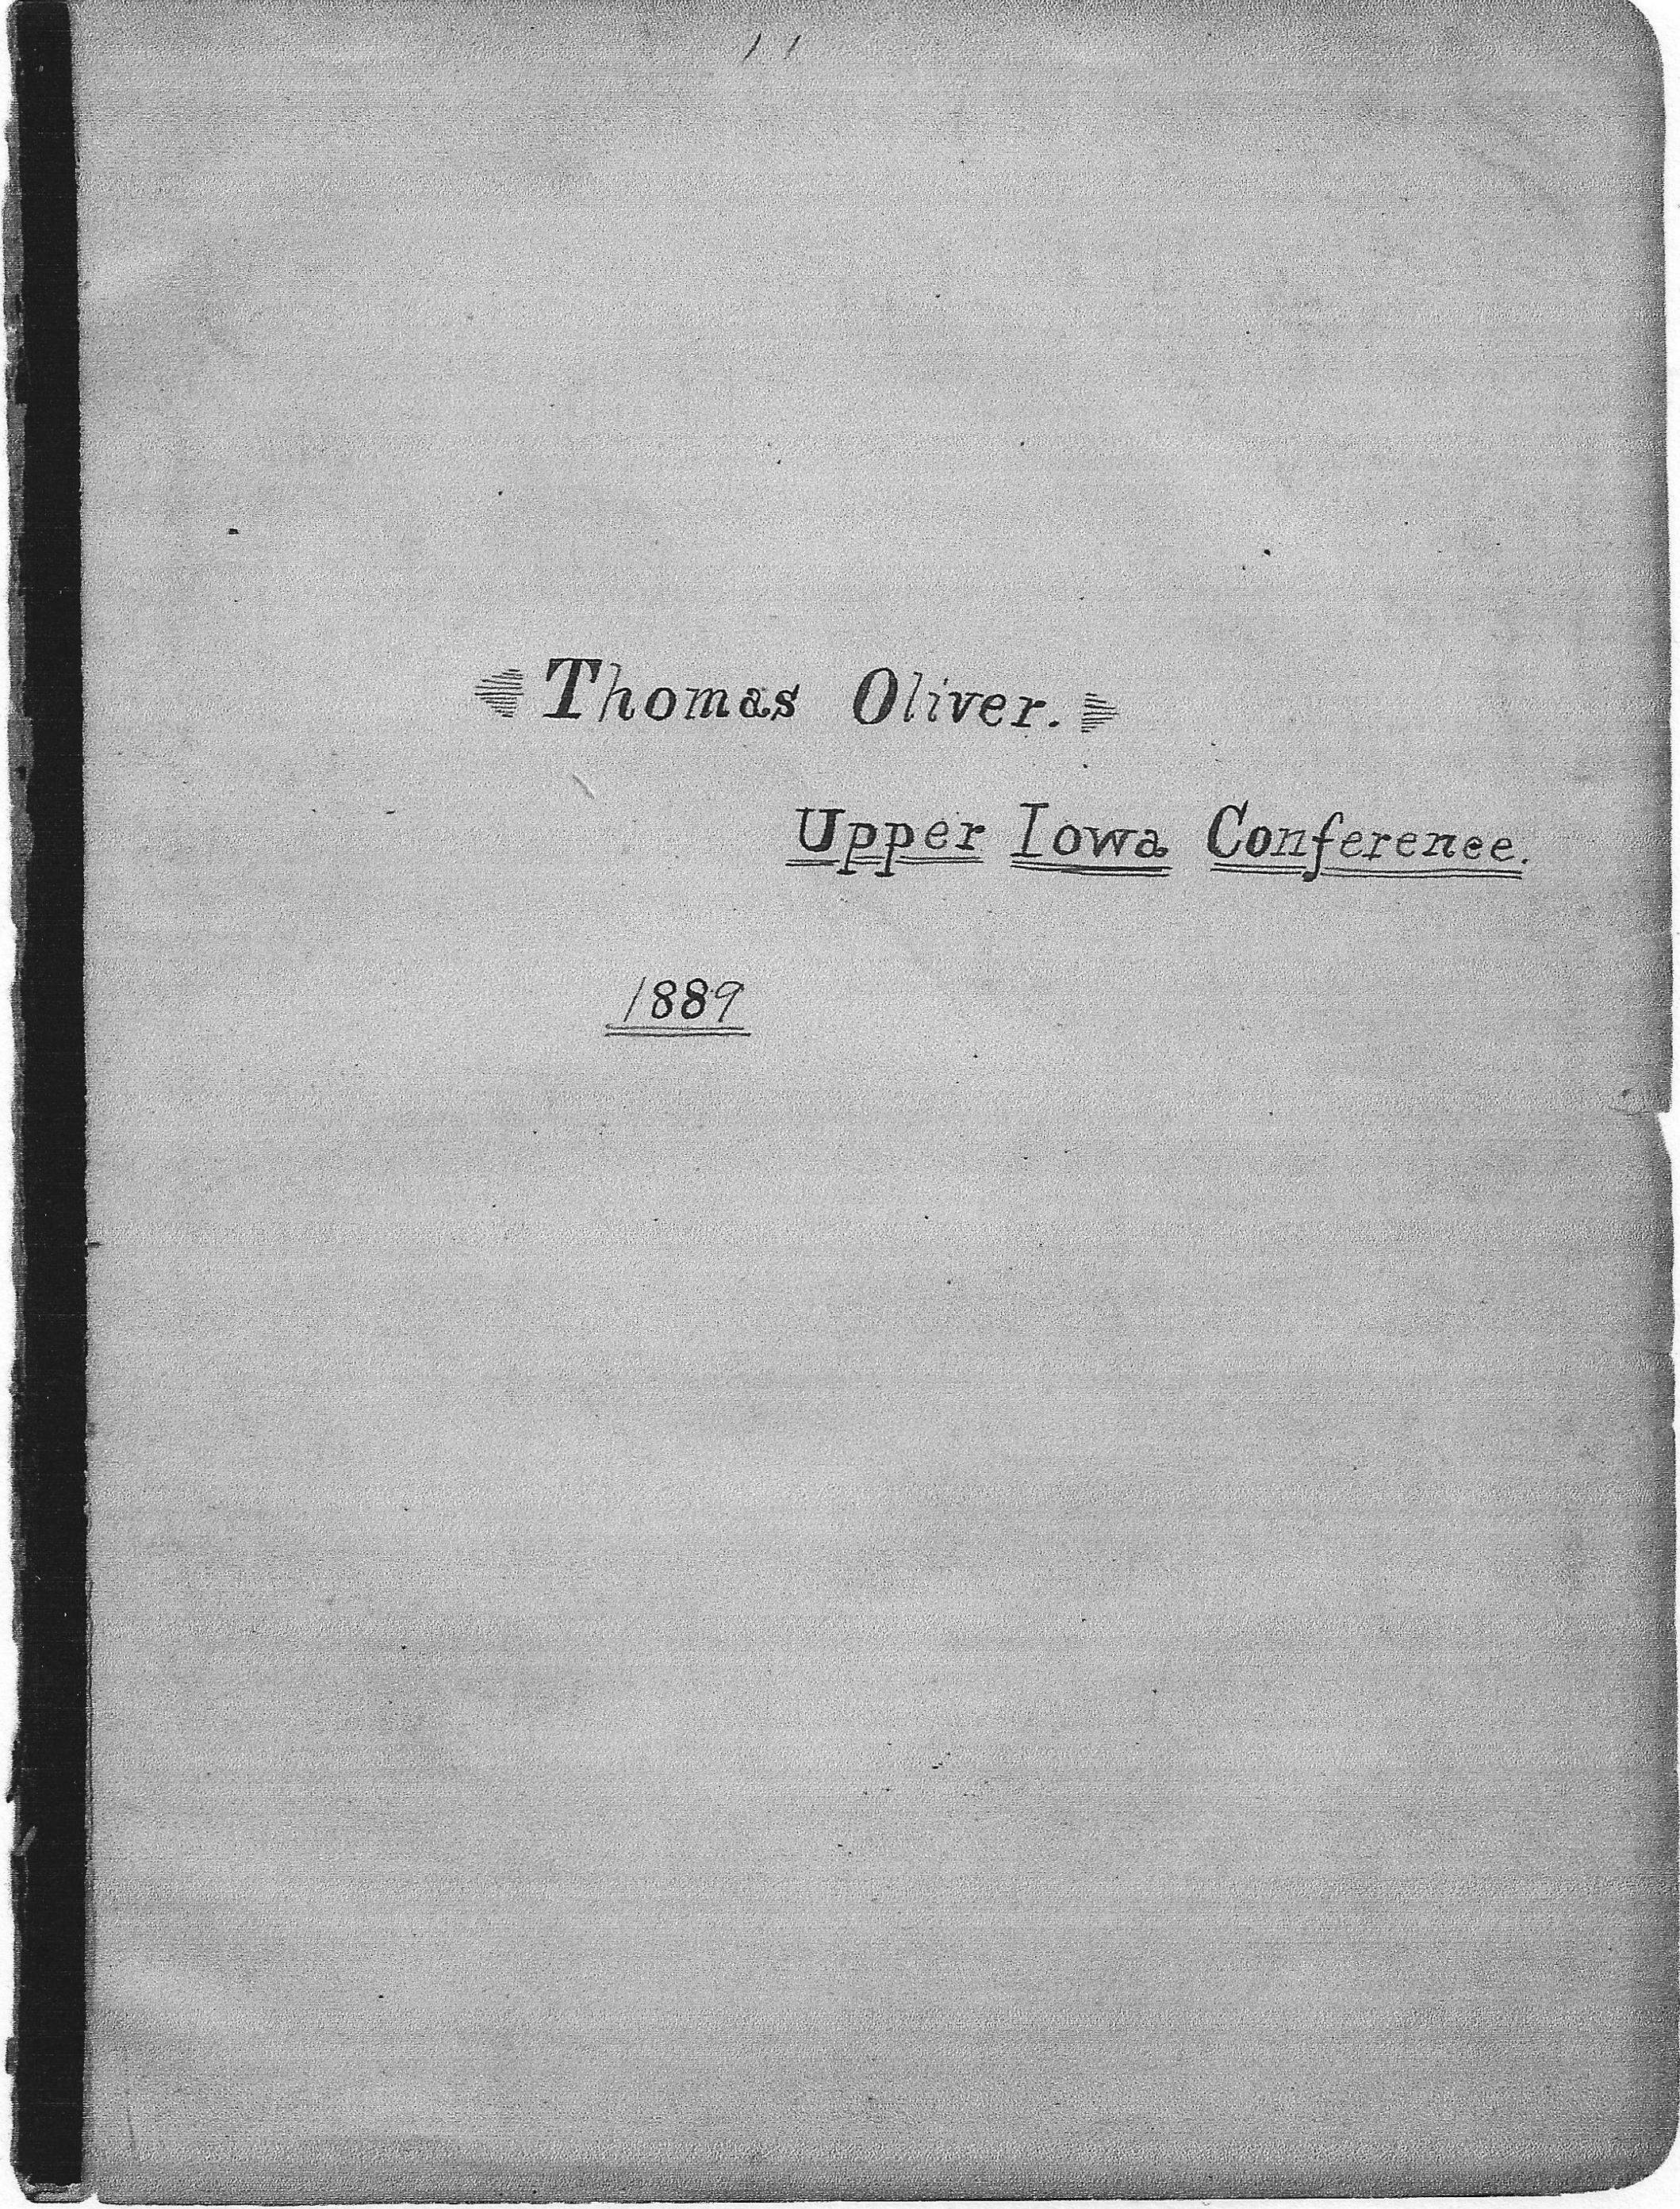 Thomas Oliver's bible